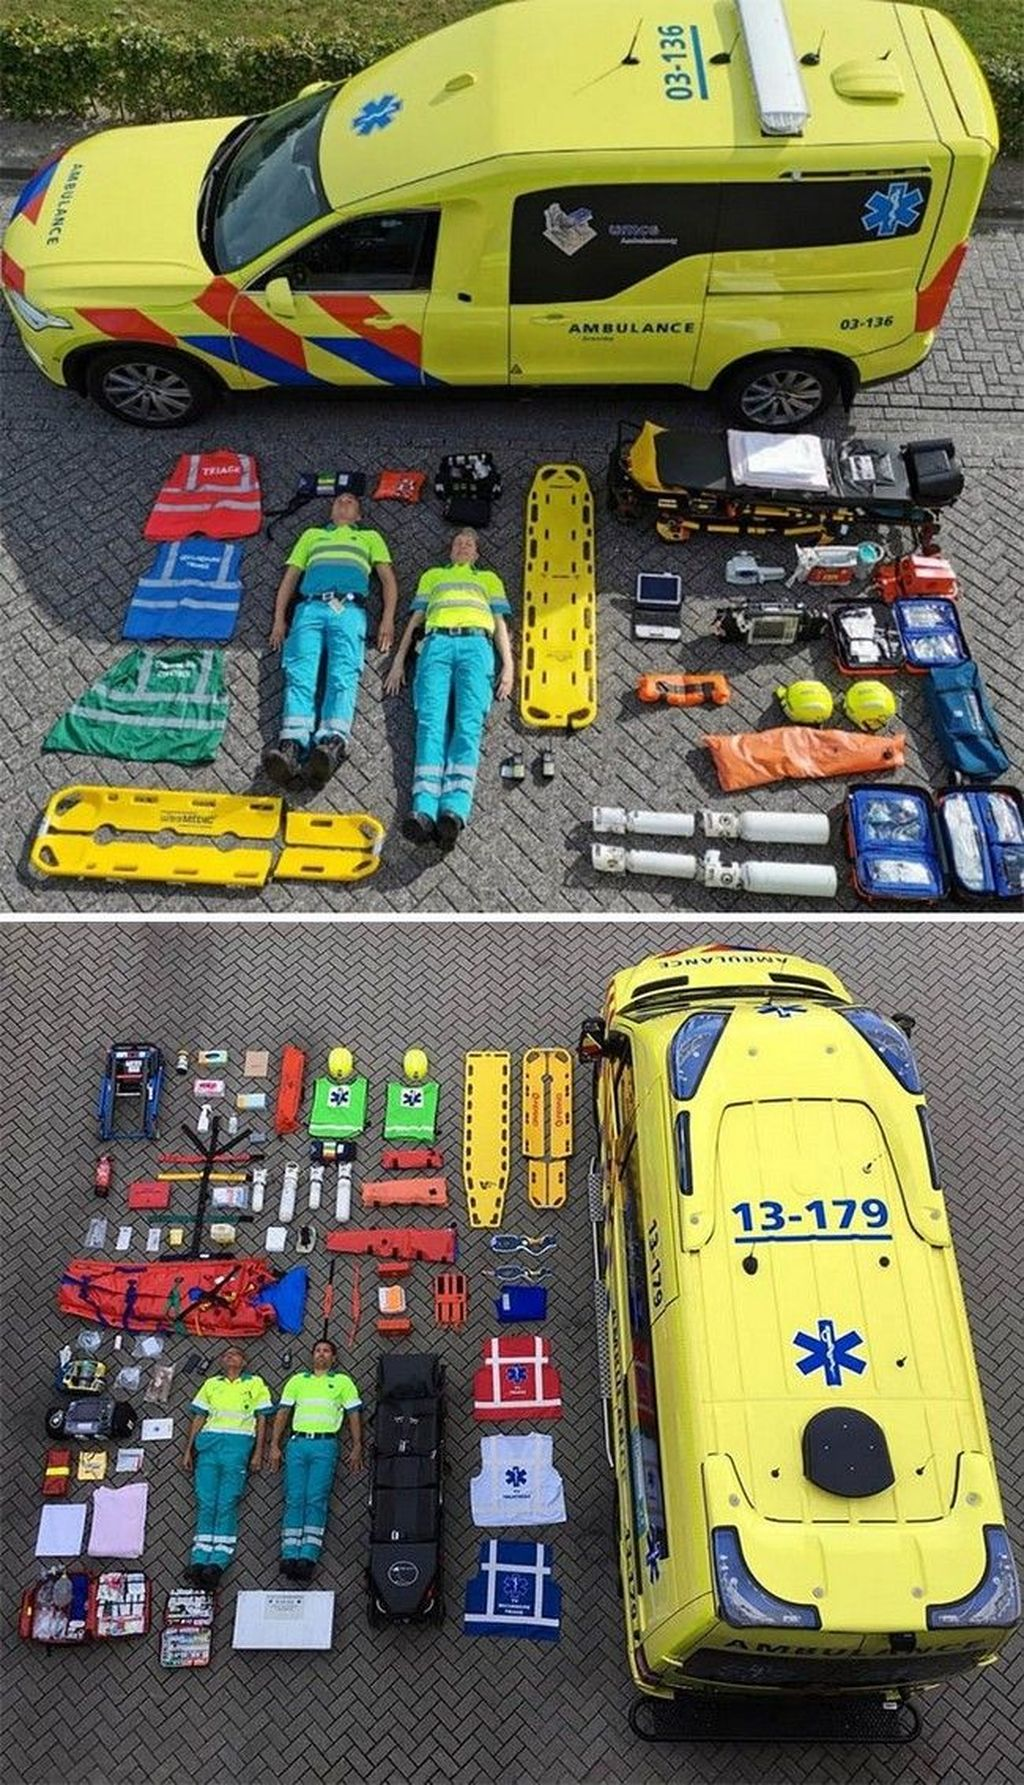 Ambulans Belanda Foto: tudointeressante